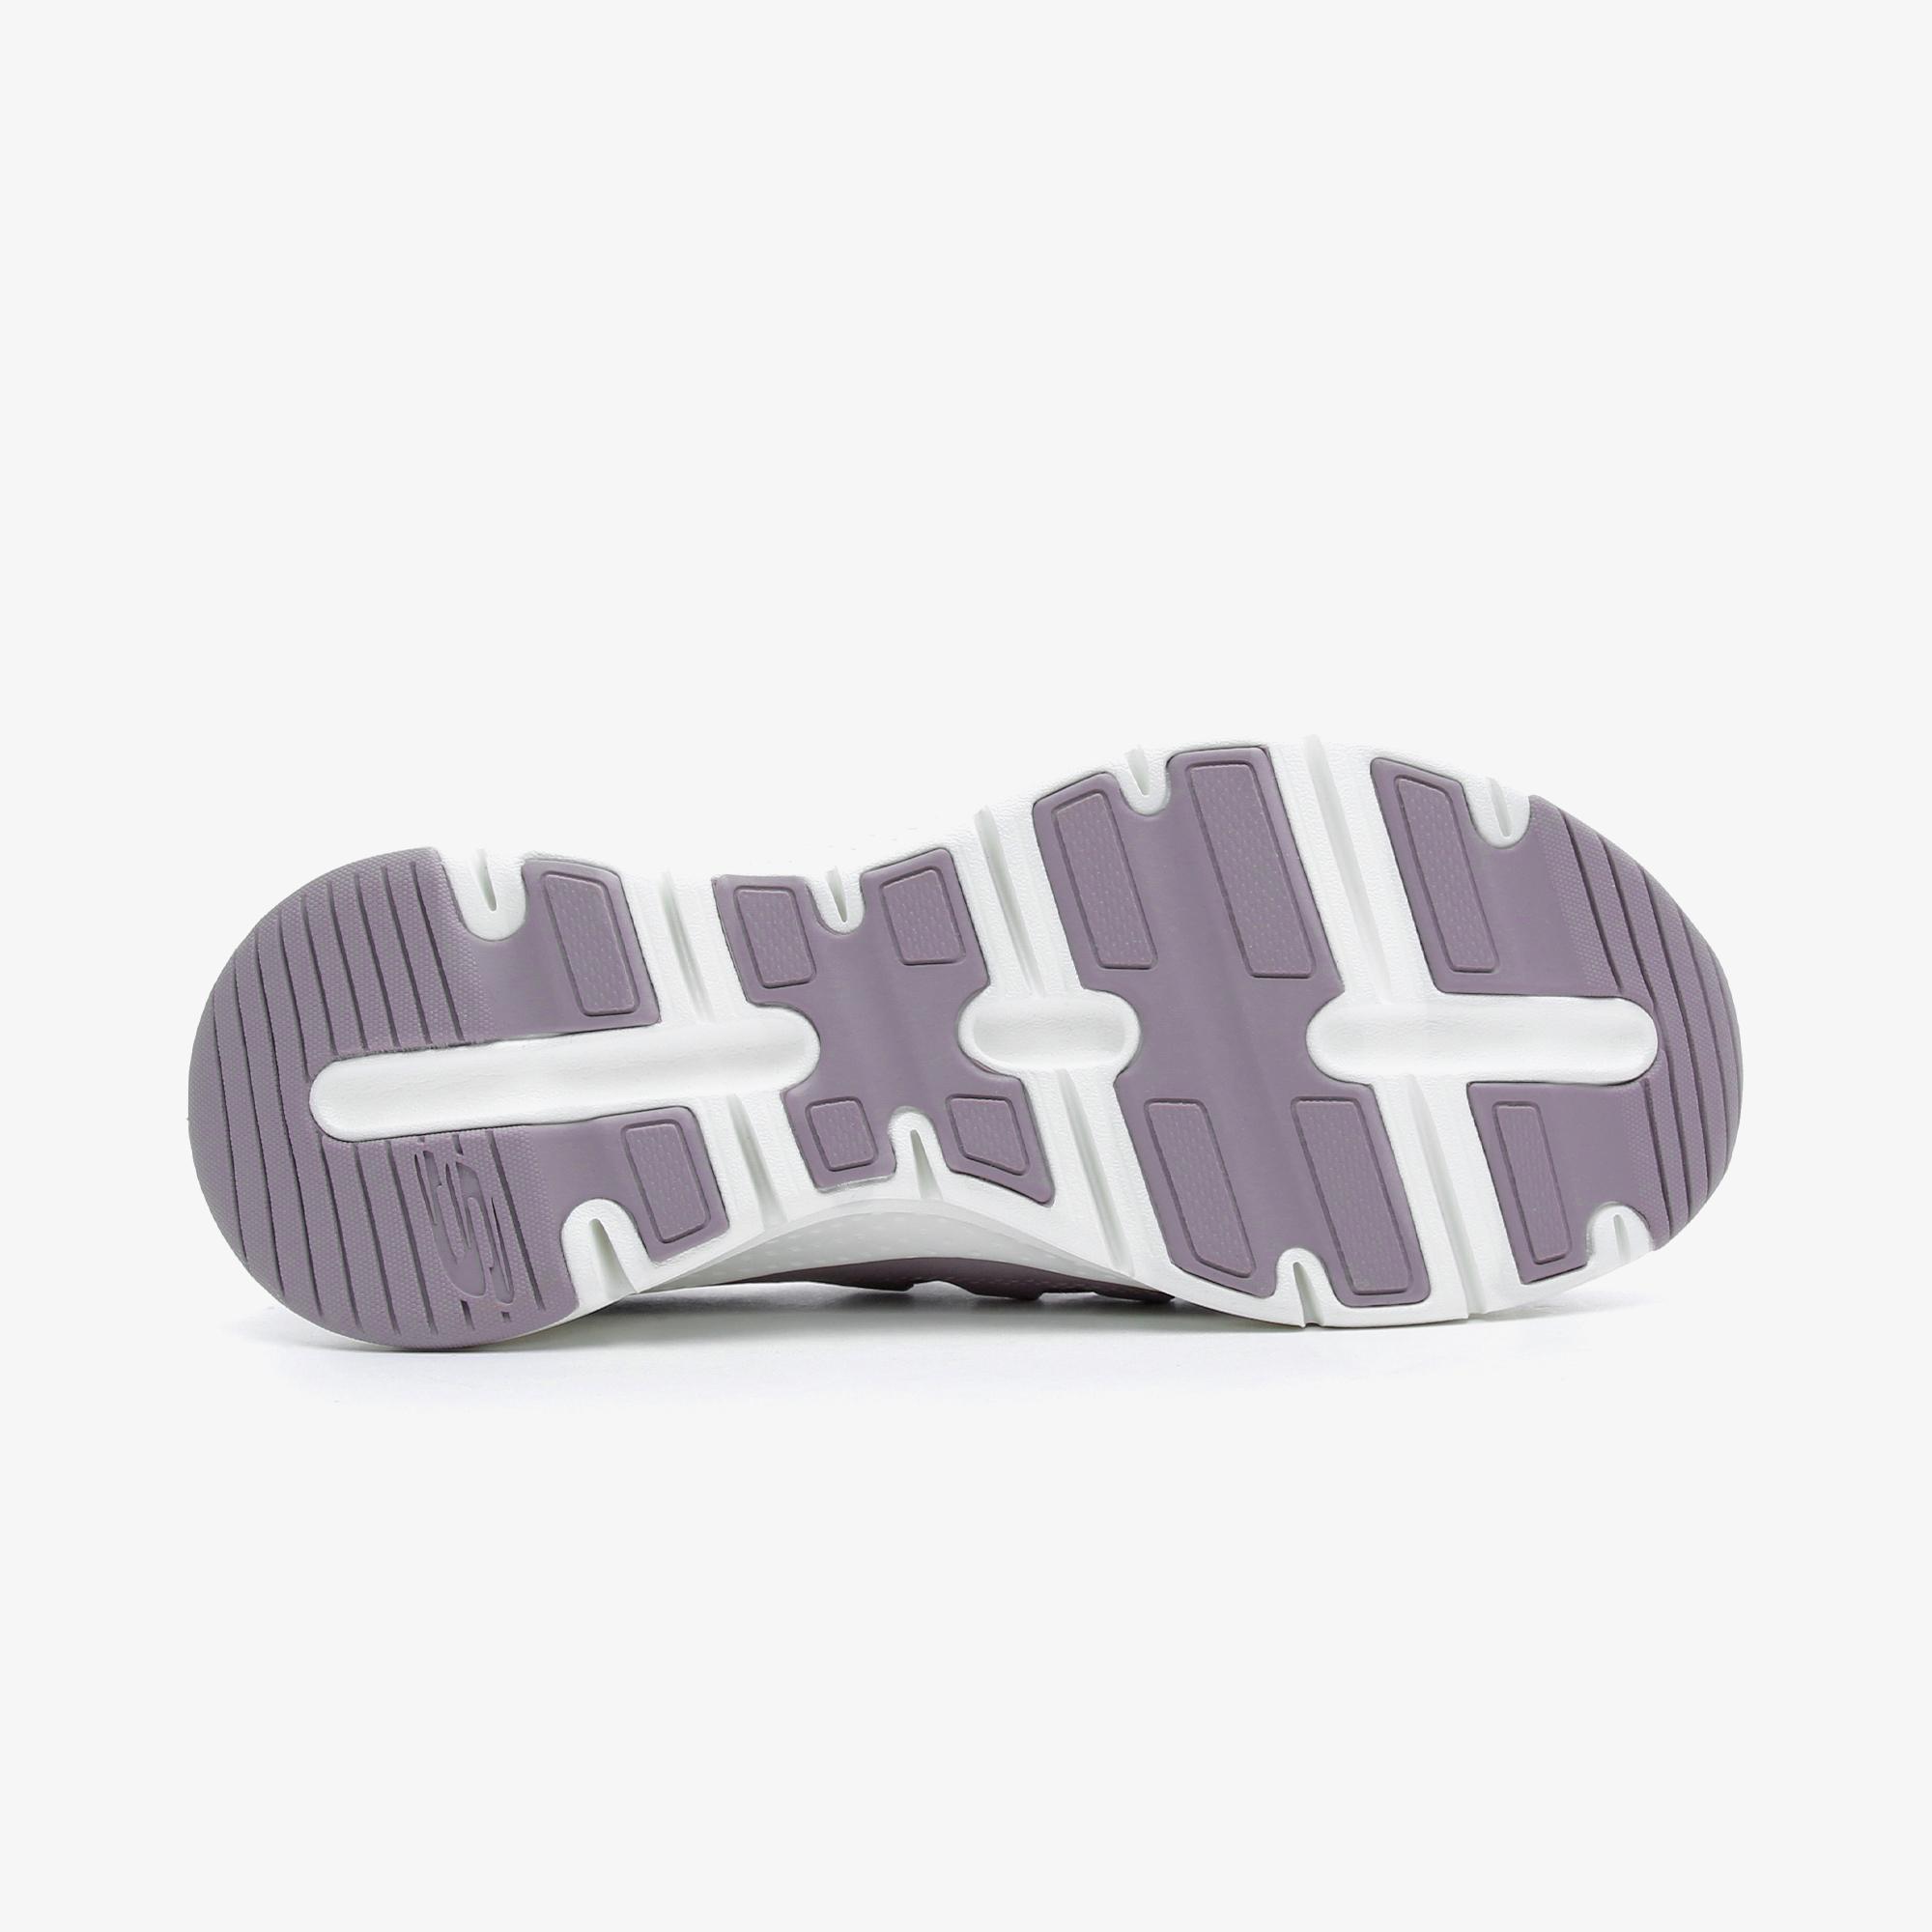 Skechers Arch Fit - Lucky Thoughts Kadın Mor Spor Ayakkabı